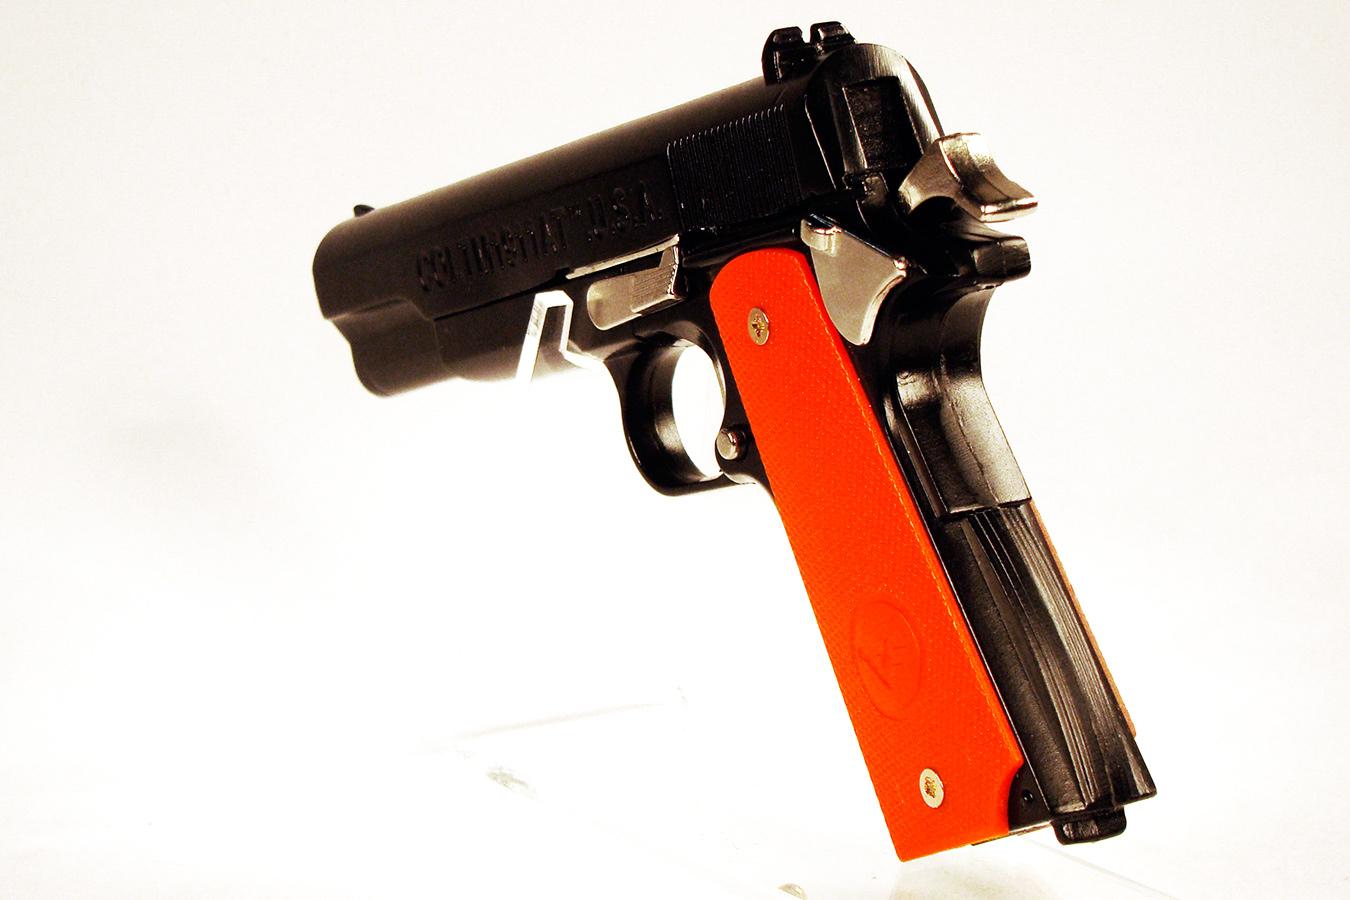 Colt M1911A1 15см изображение 1